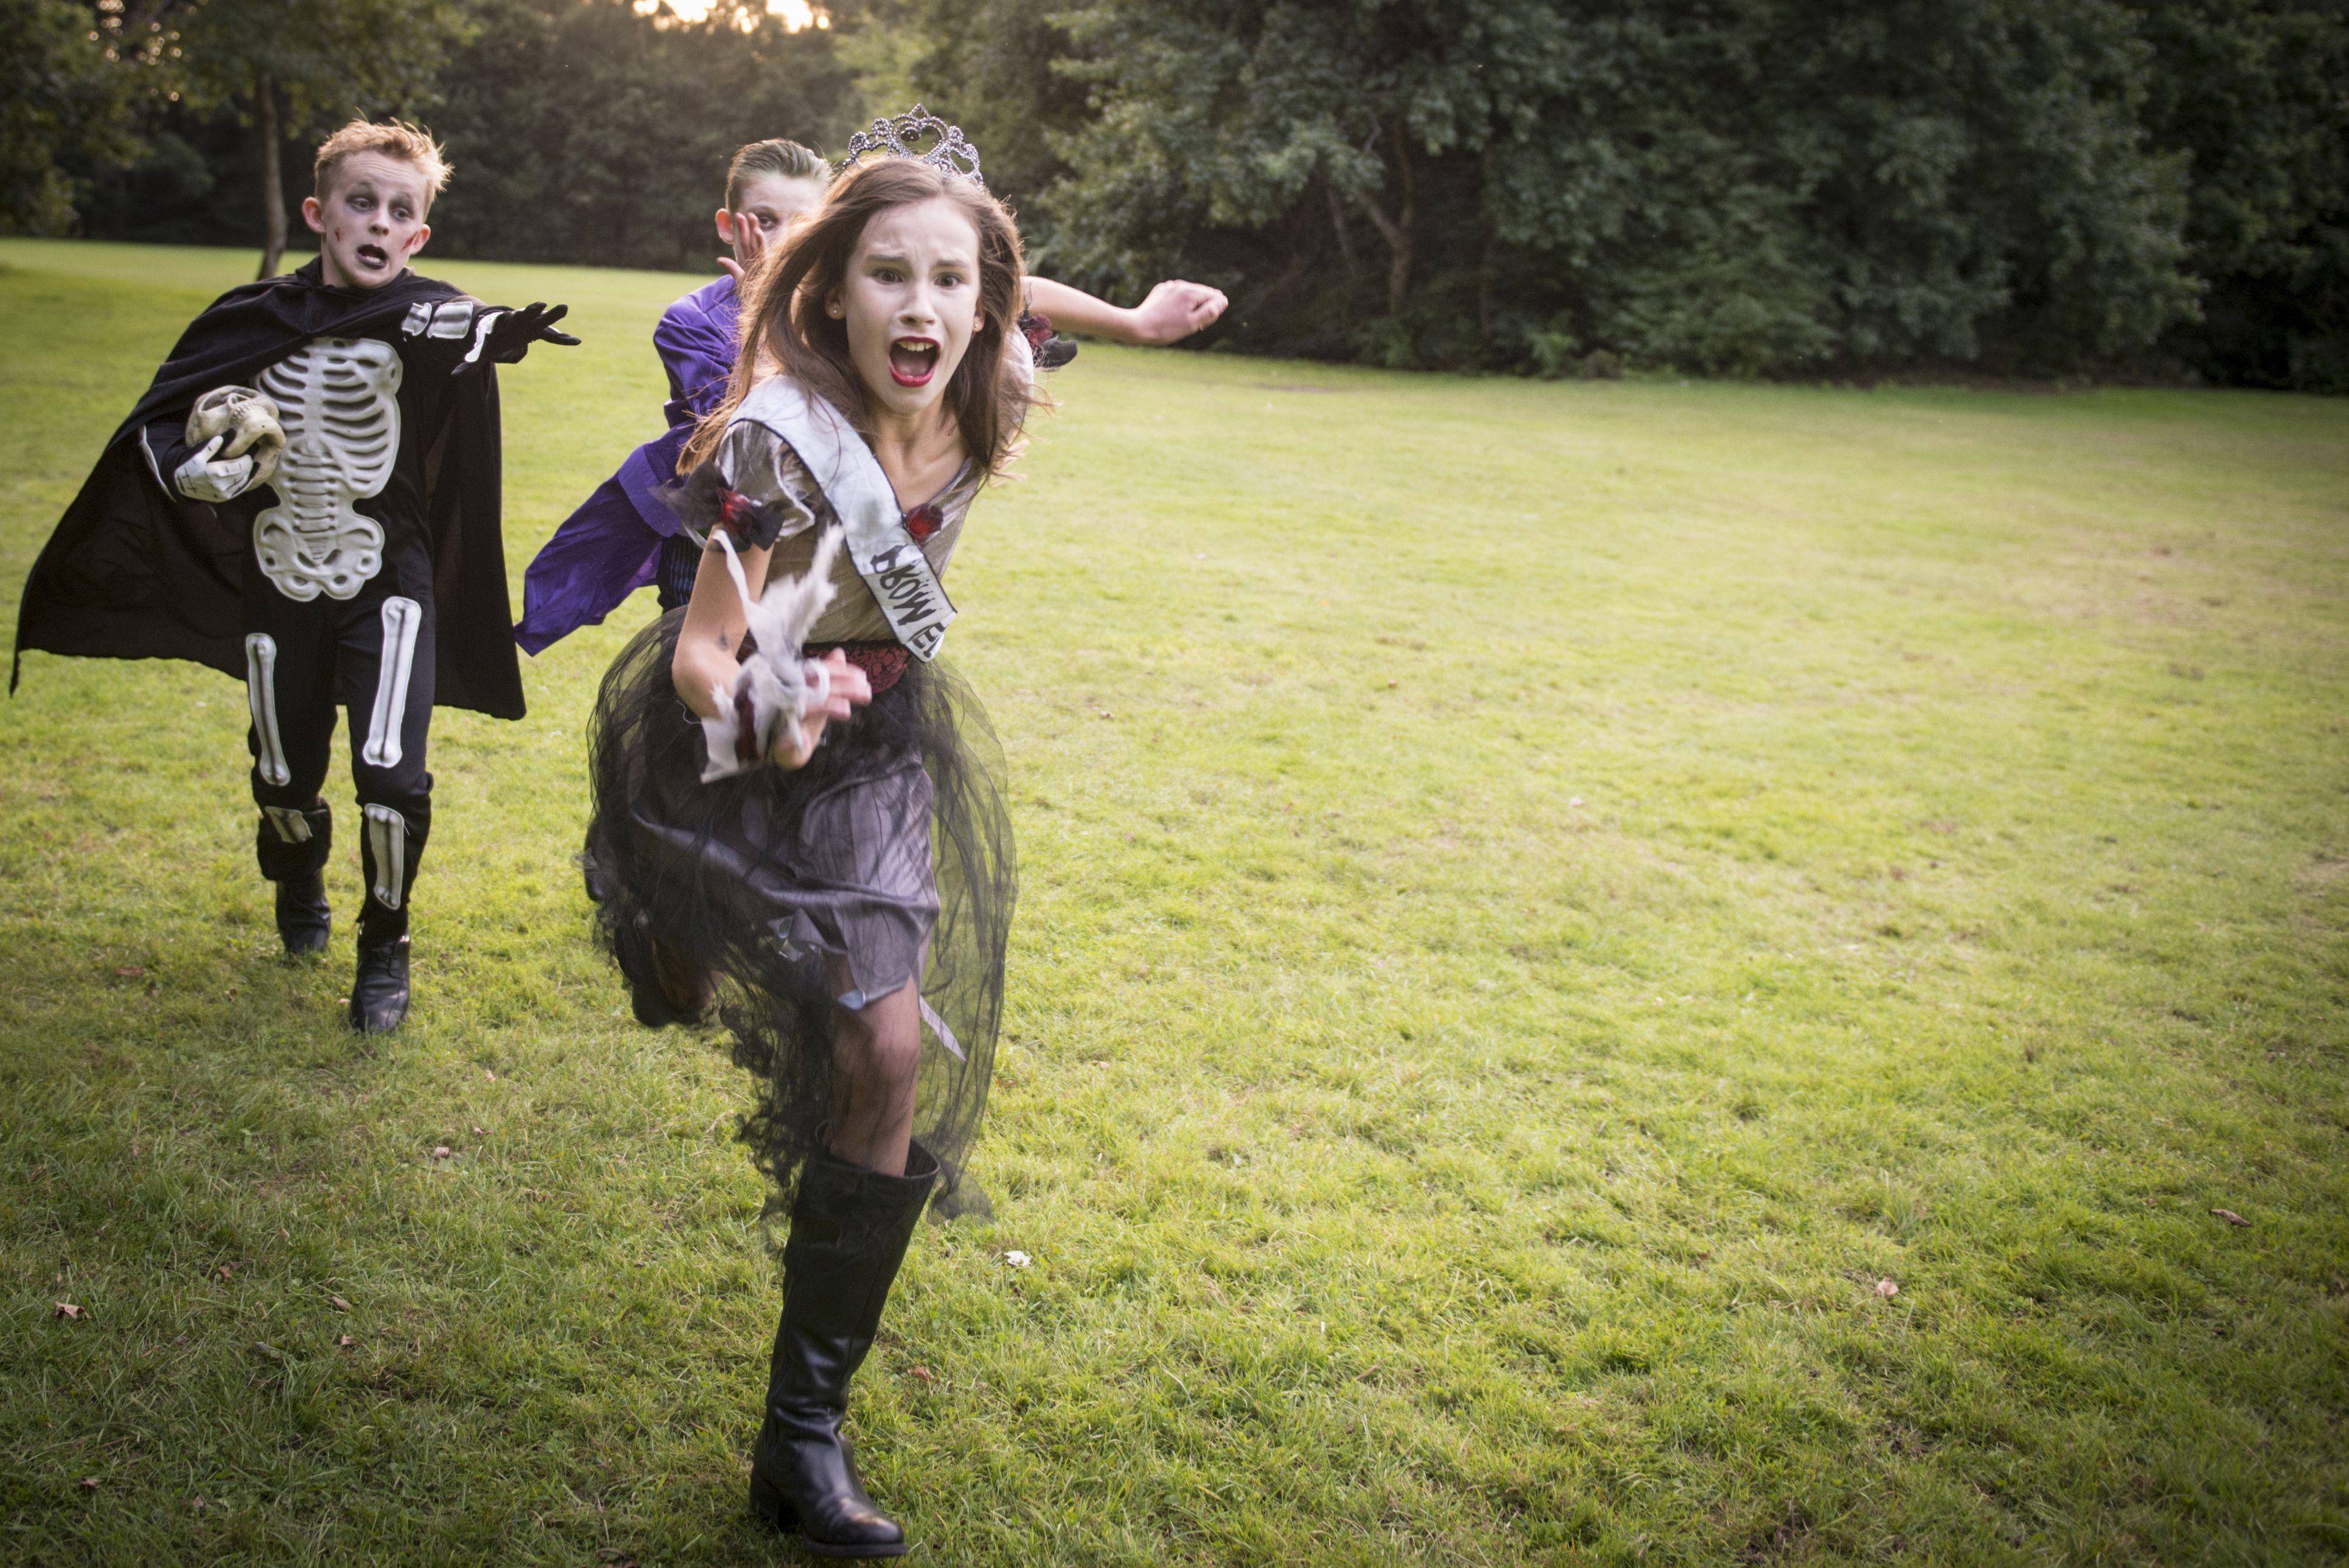 children in Halloween costumes running